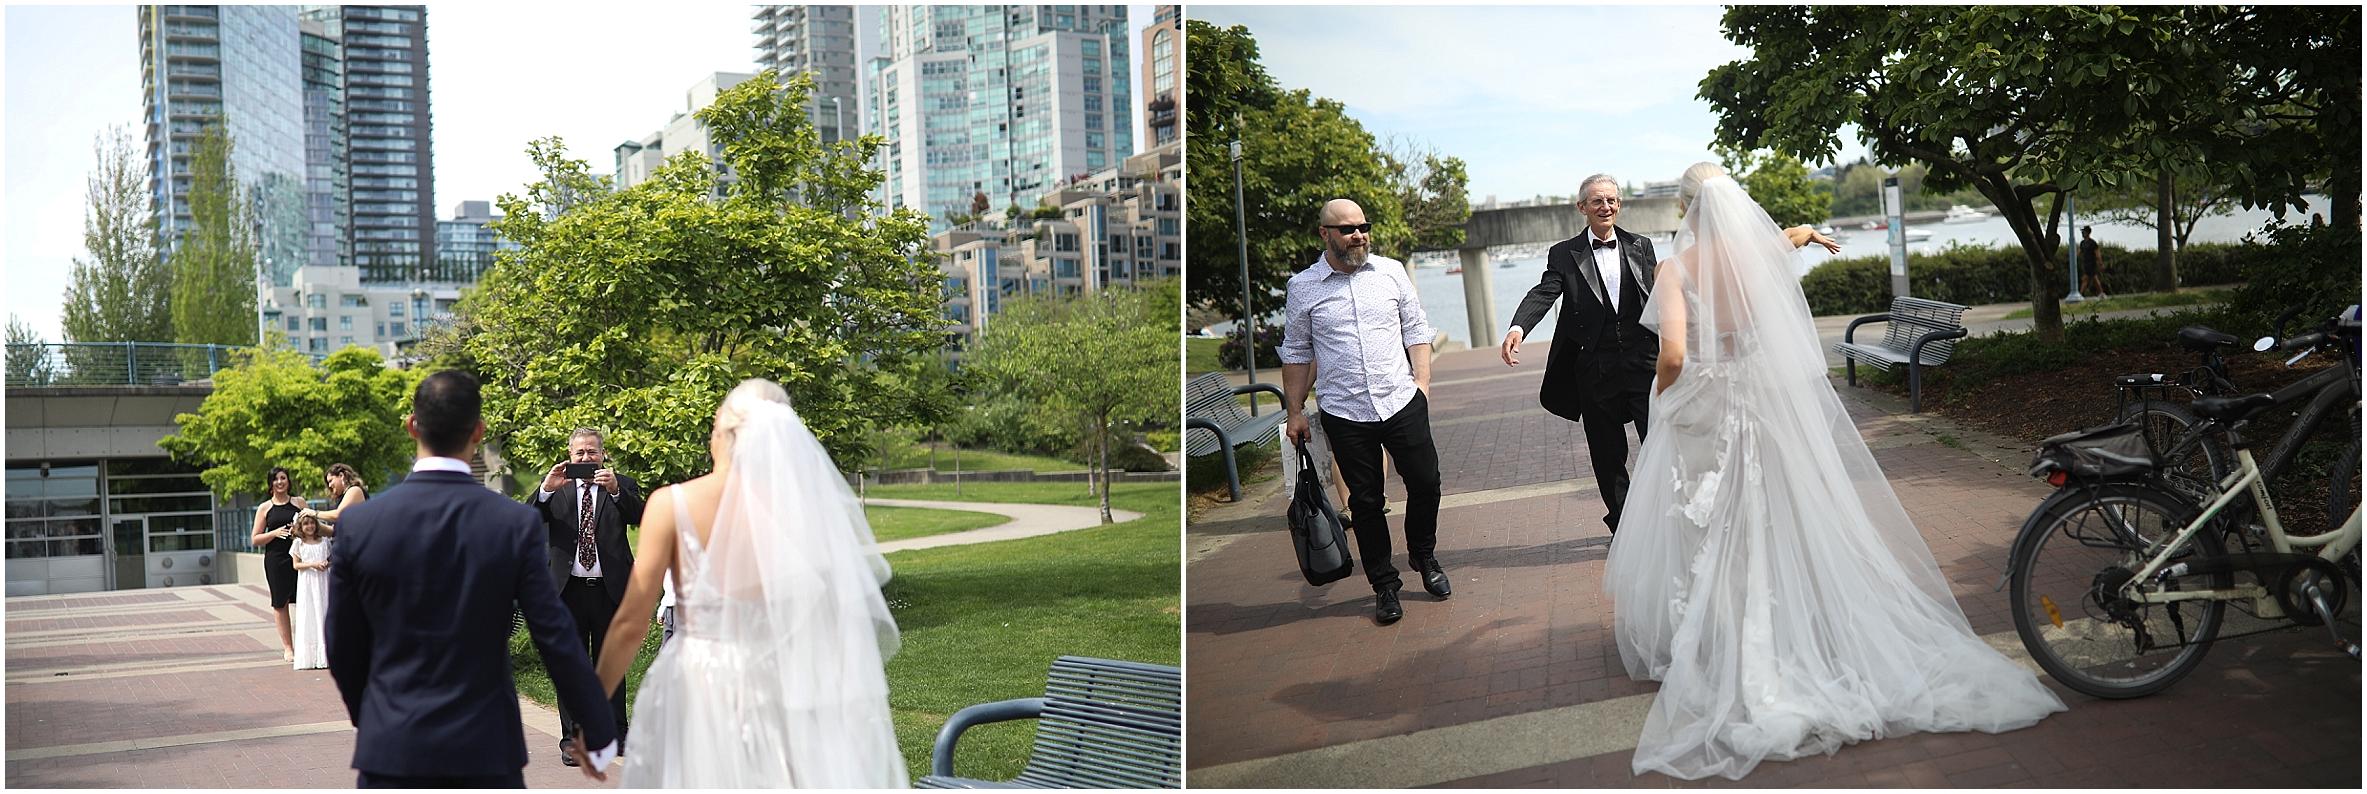 vancouver-wedding-photographer-the-loft-earls-yaletown_0018.jpg